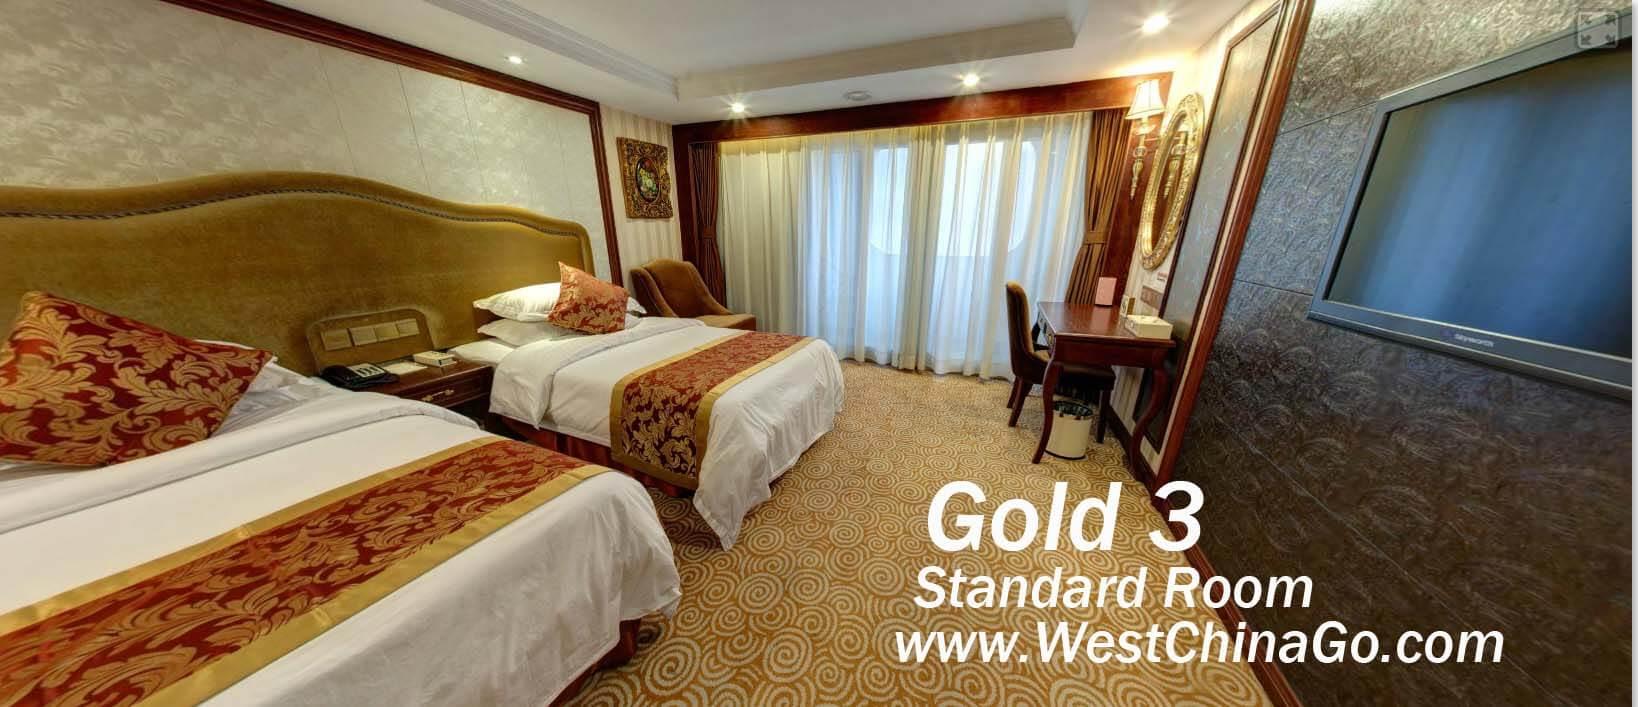 yangtze river gold 3